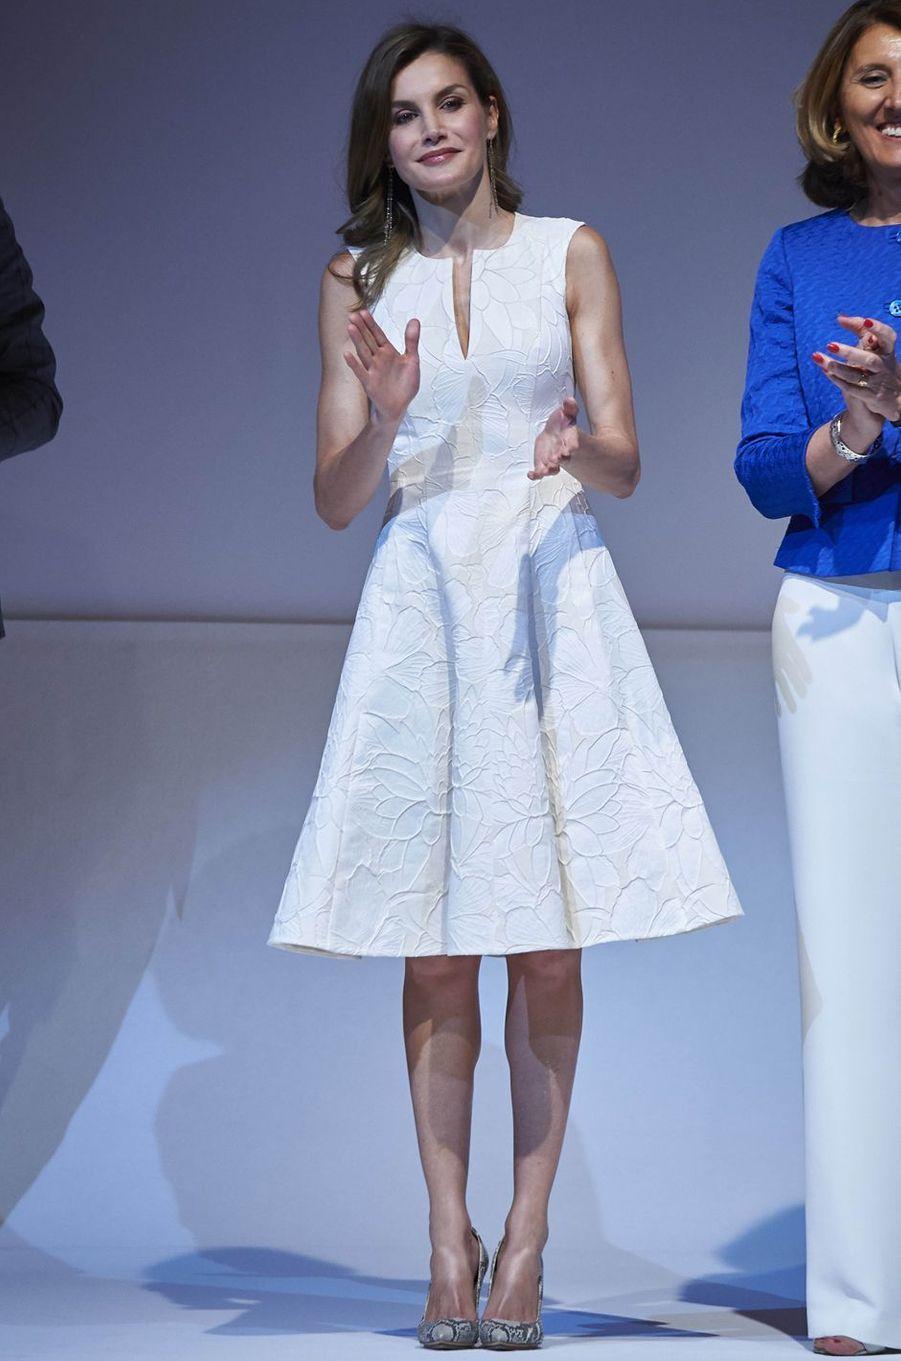 La reine Letizia d'Espagne en Carolina Herrera, le 17 juillet 2017